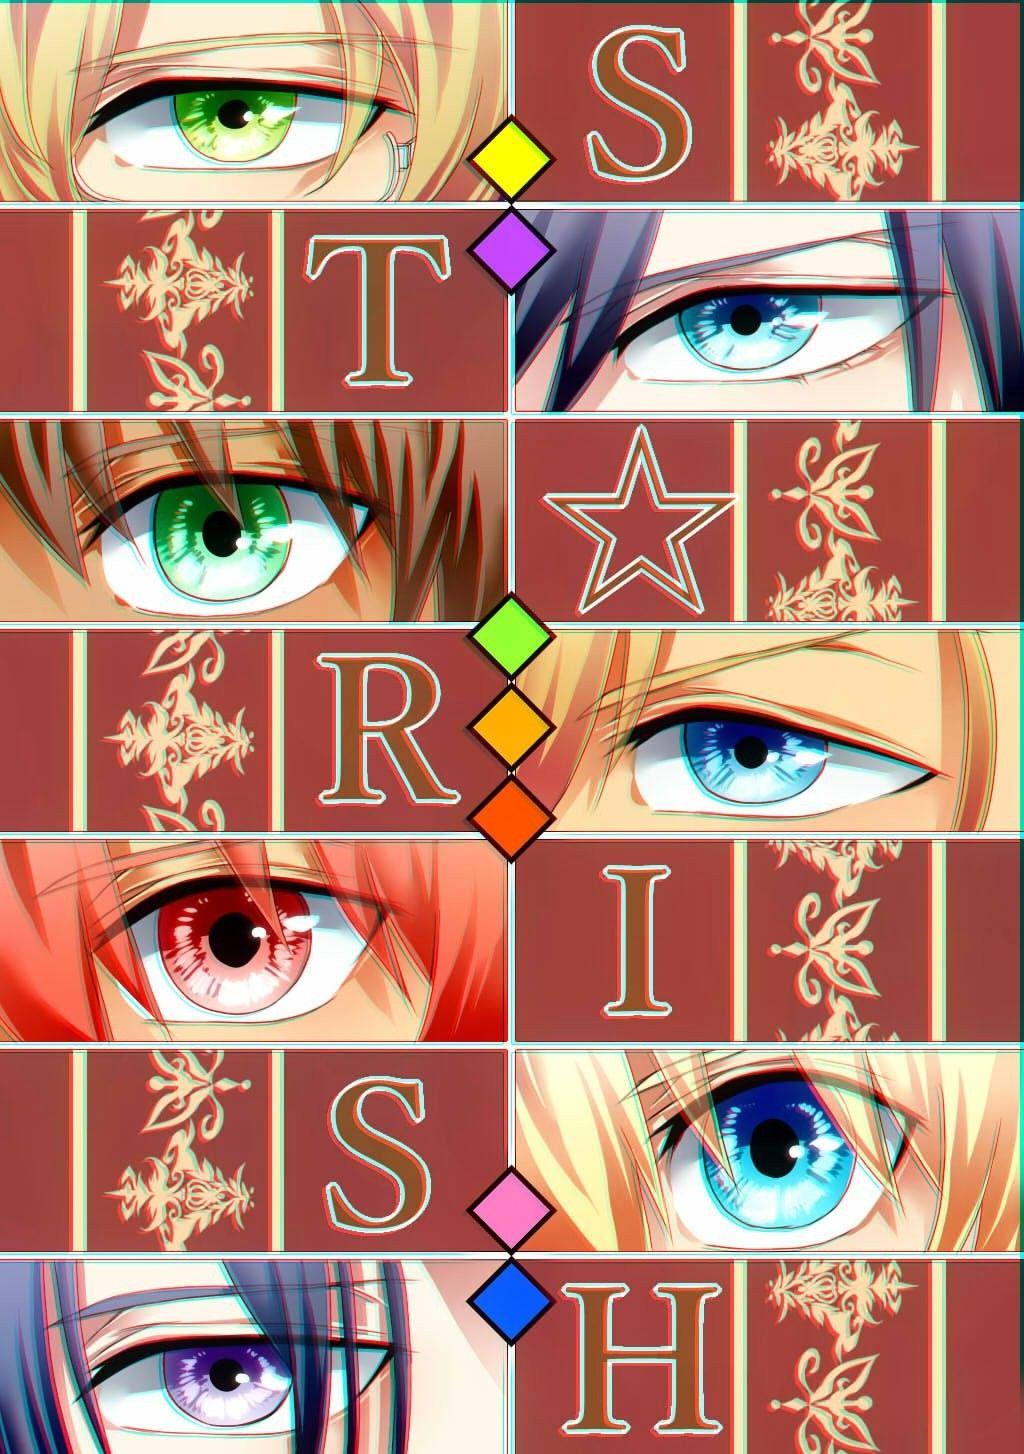 S.T.A.R.I.S.H Uta no prince sama, Otoya ittoki, Anime